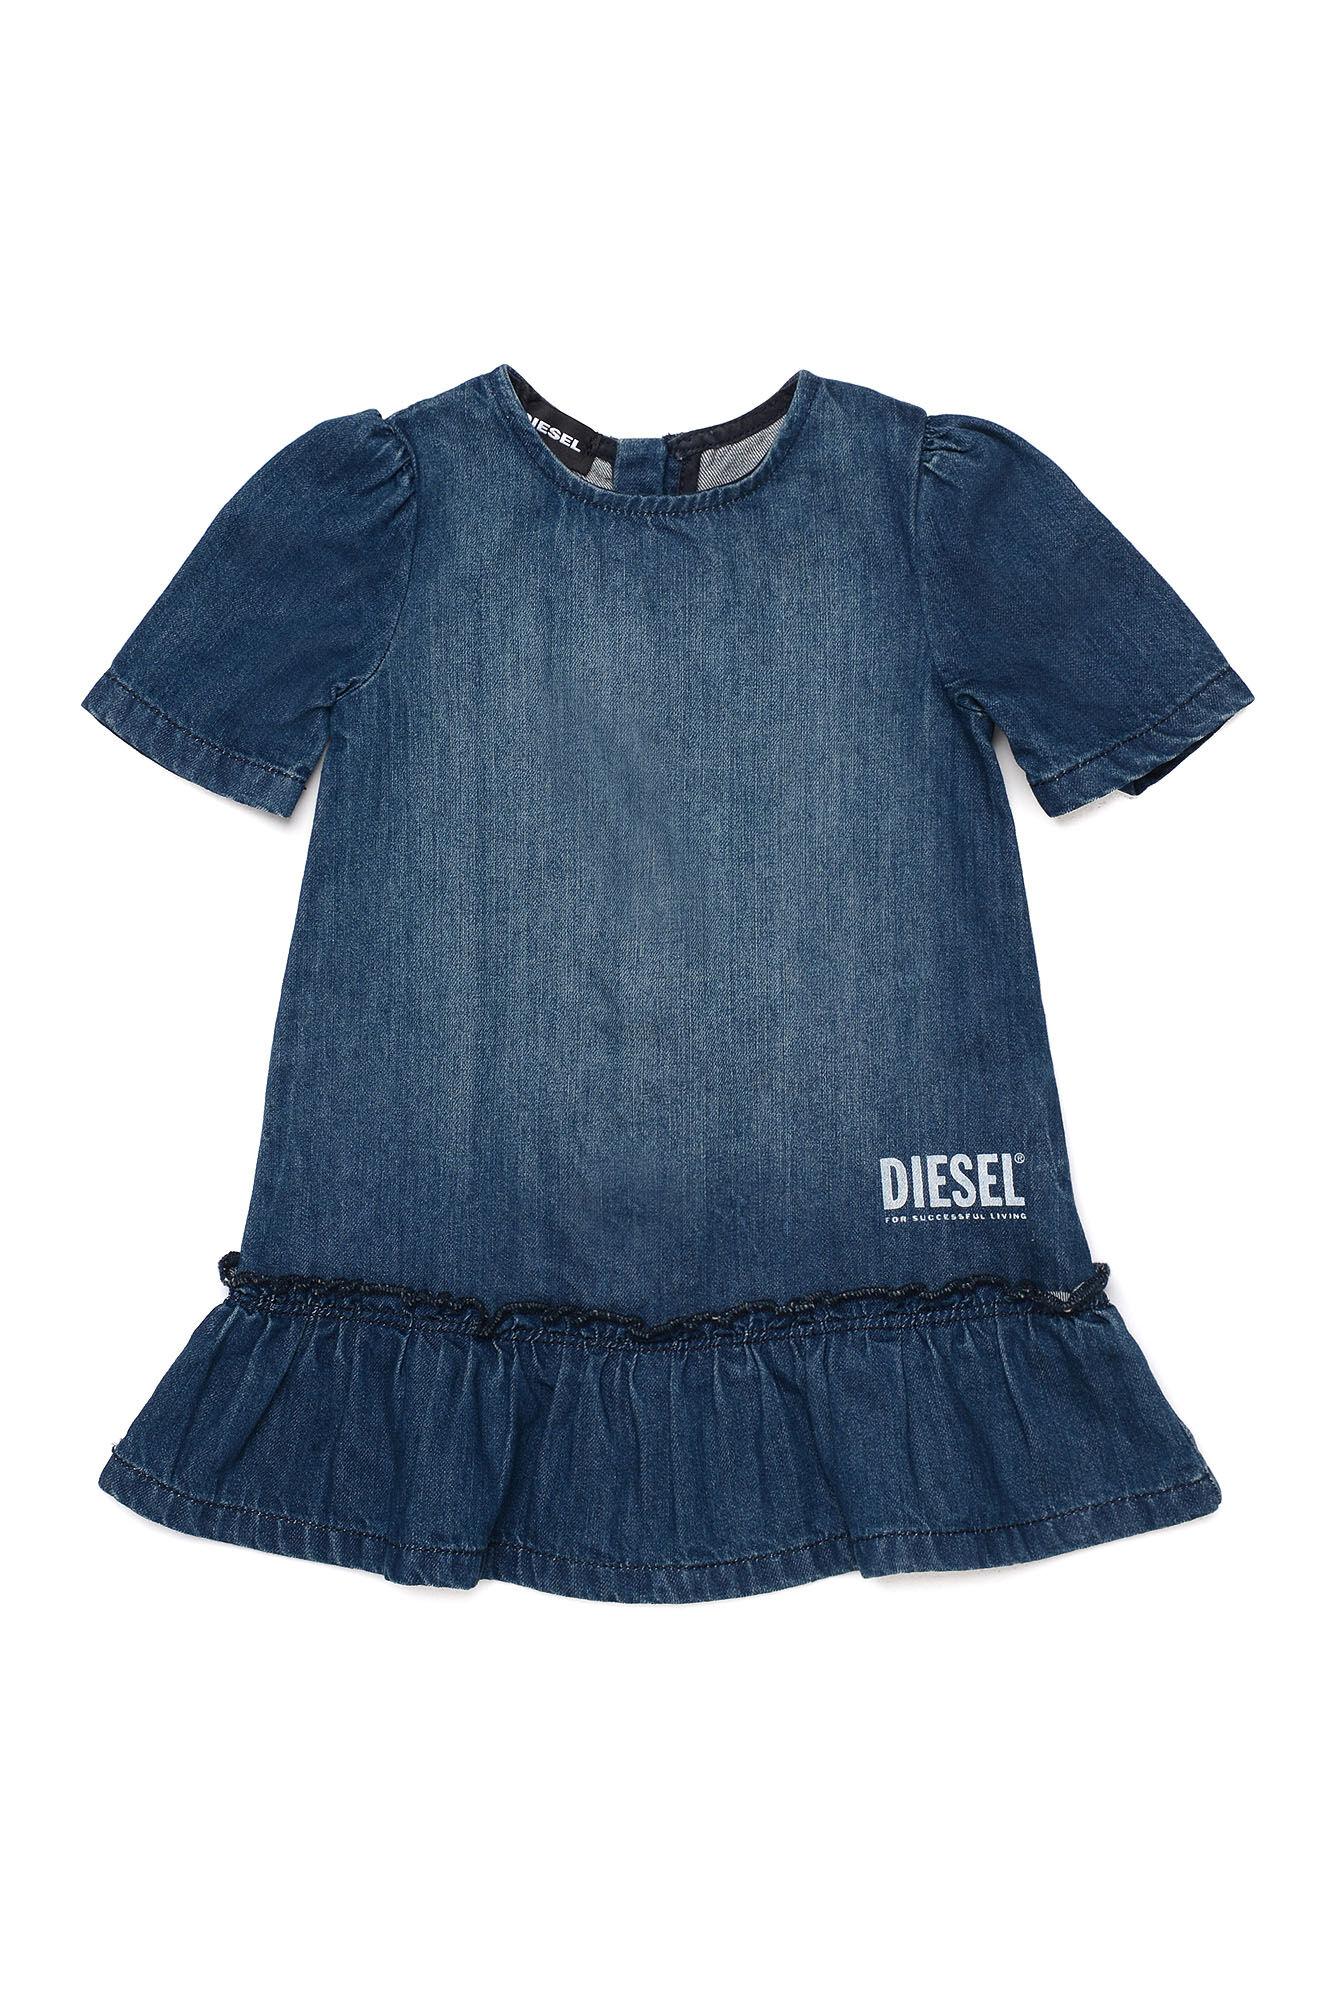 Deivib Abito - Diesel Kid